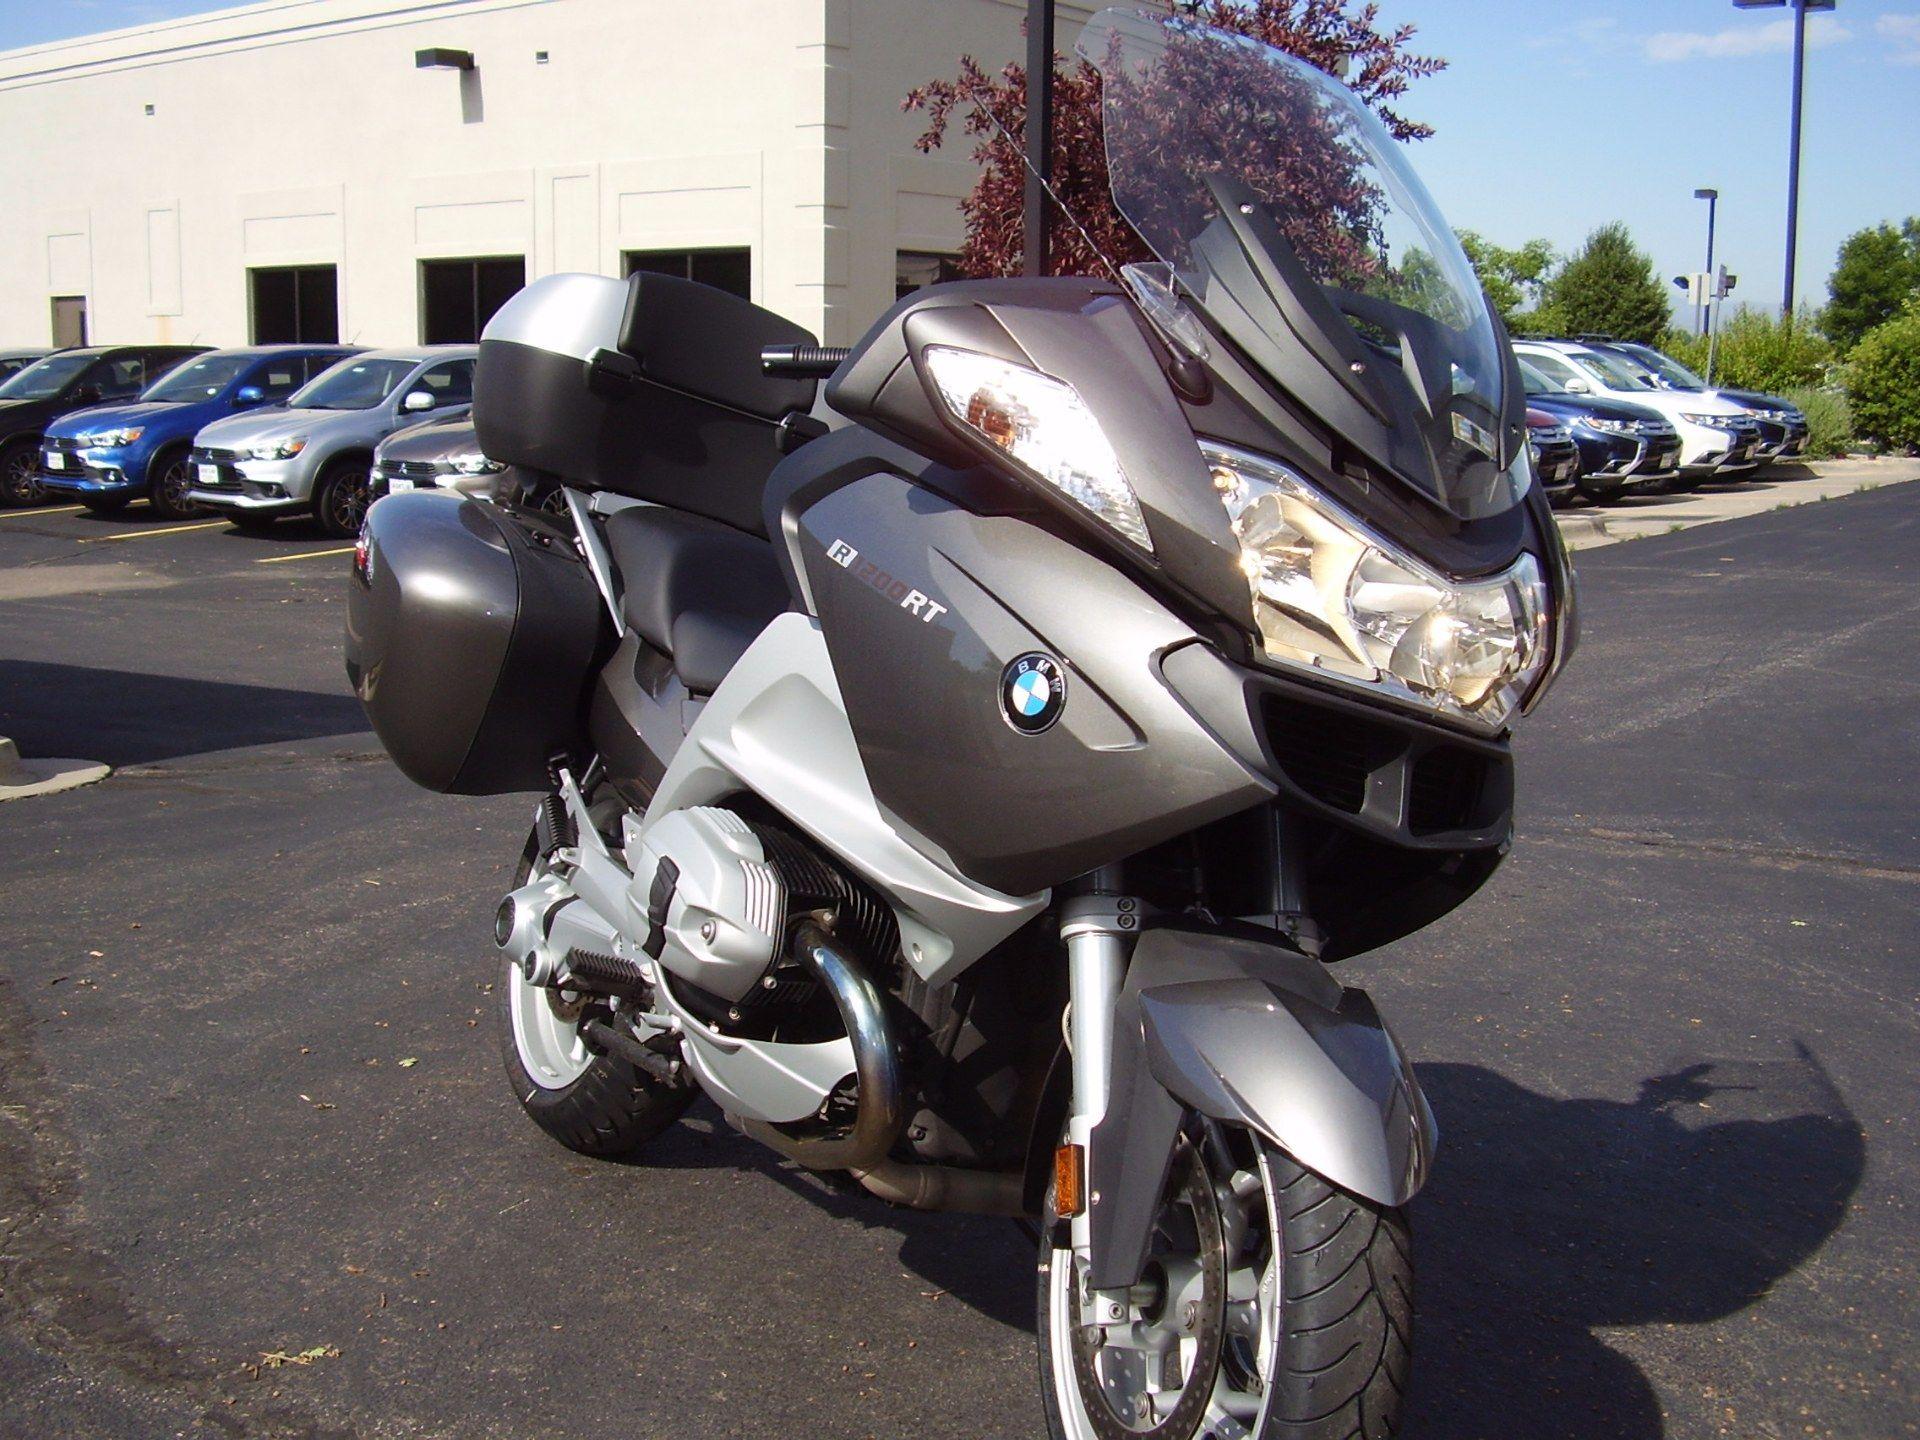 2013 BMW R 1200 RT in Aurora, Colorado